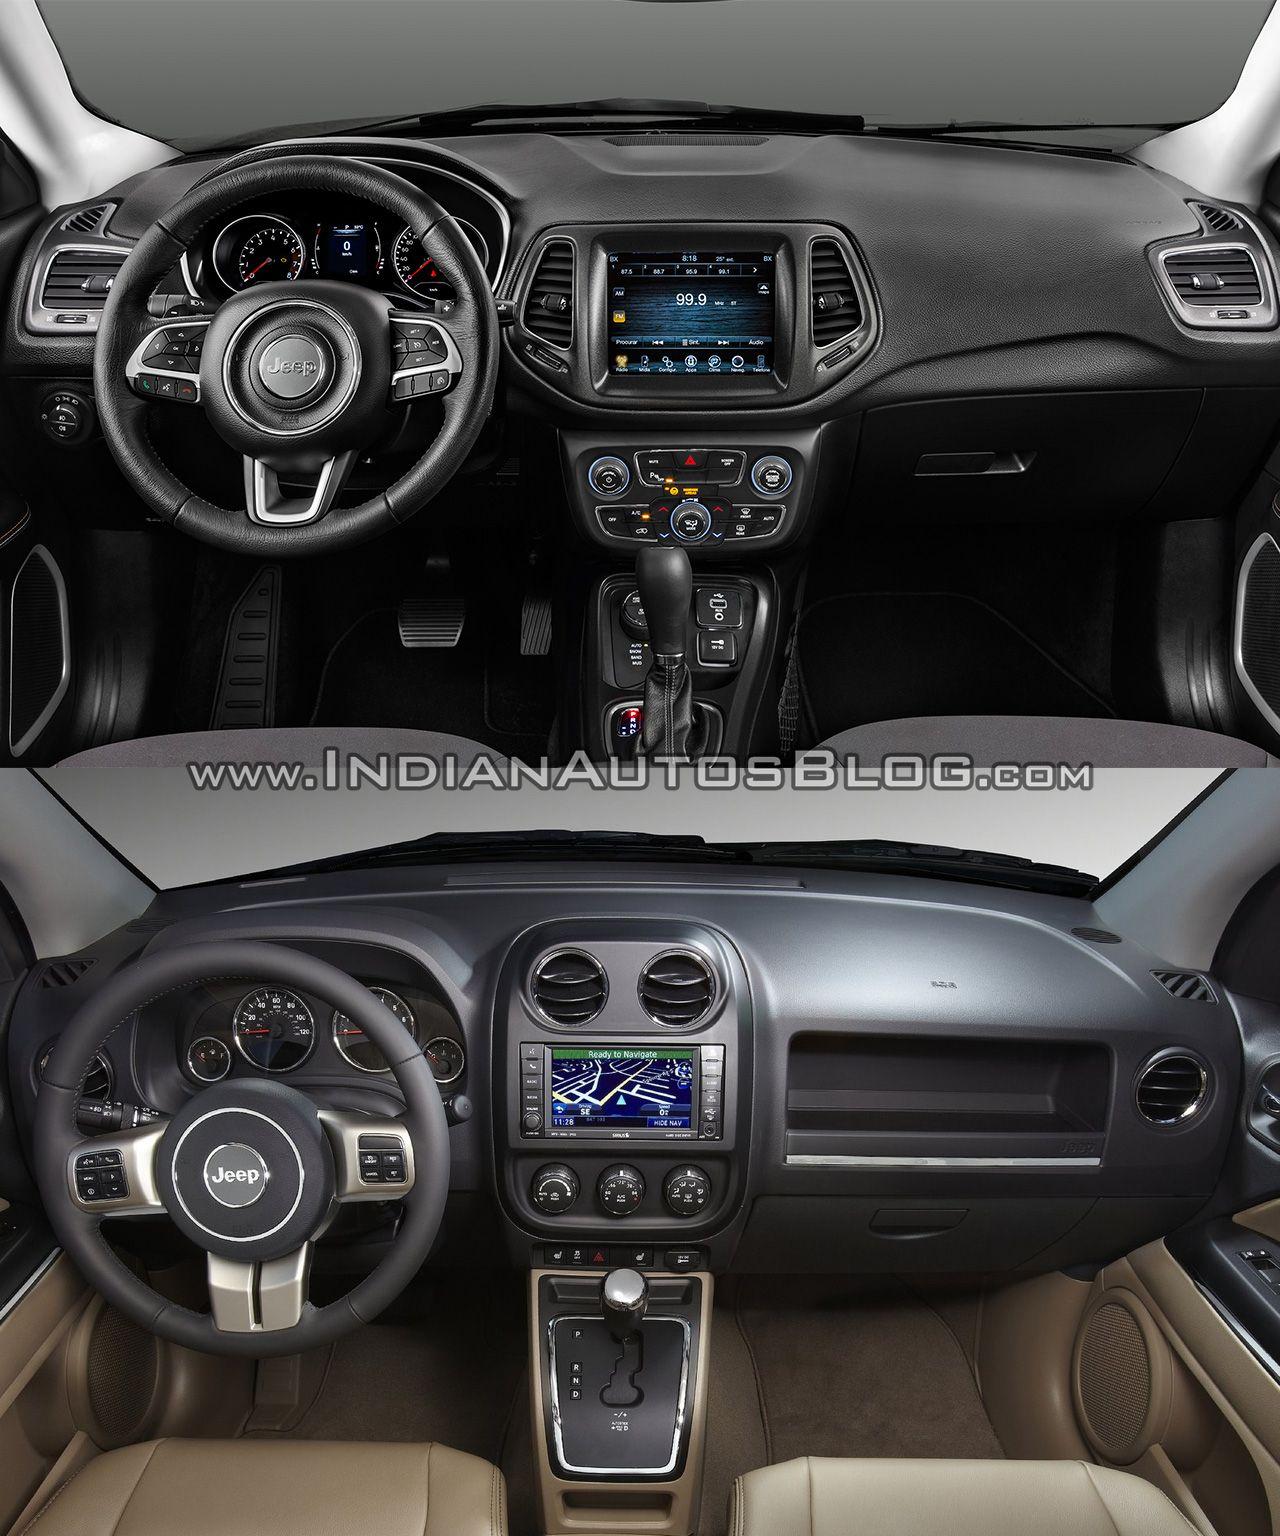 2017 Jeep Compass Vs 2011 Jeep Compass Interior Jeep Pinterest 2011 Jeep Compass Jeep